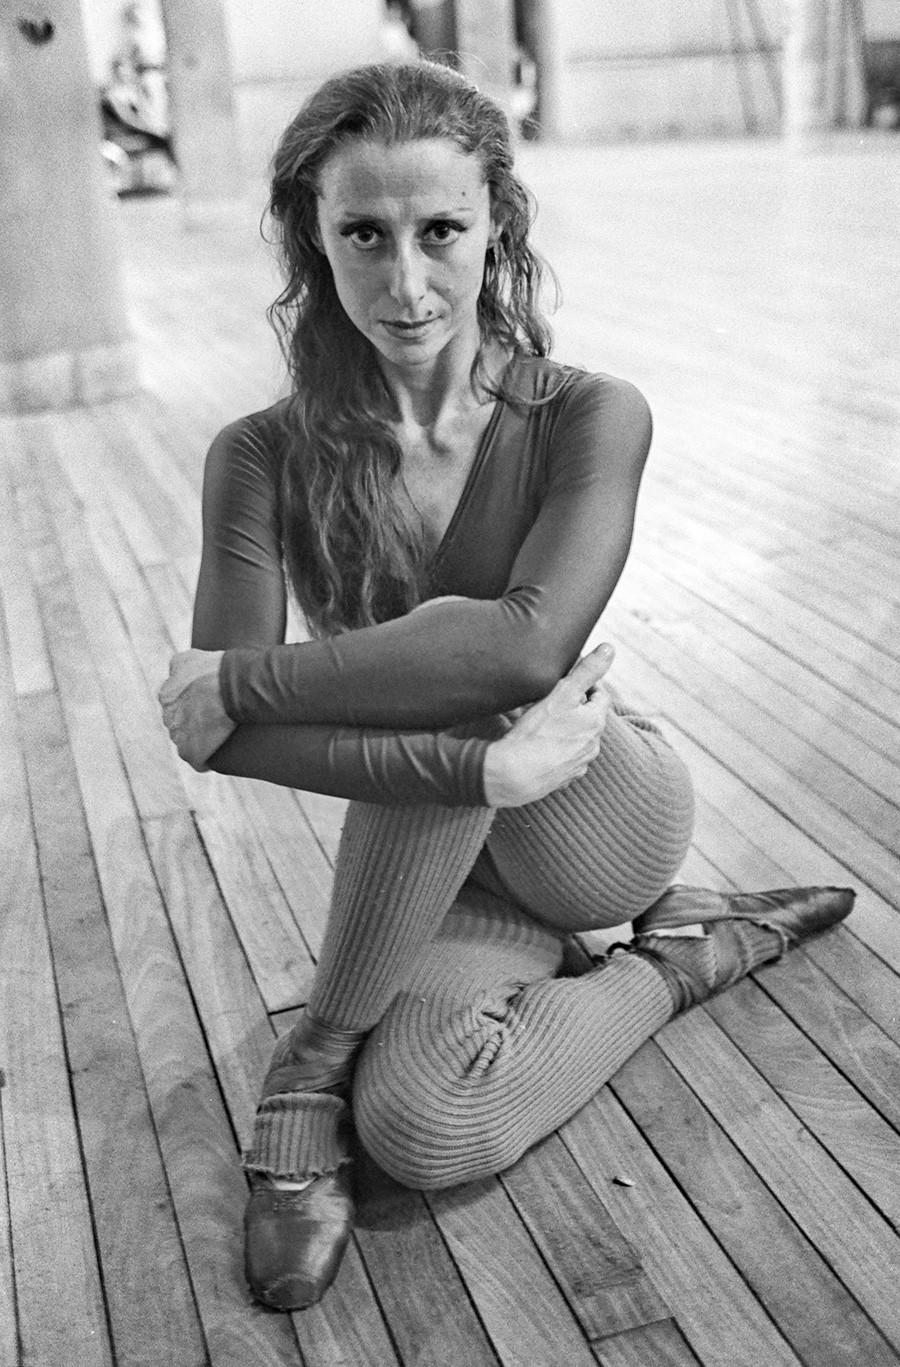 Maya Plisetskaya during rehearsal in Colon Theater, Buenos Aires, Argentina, 1976.